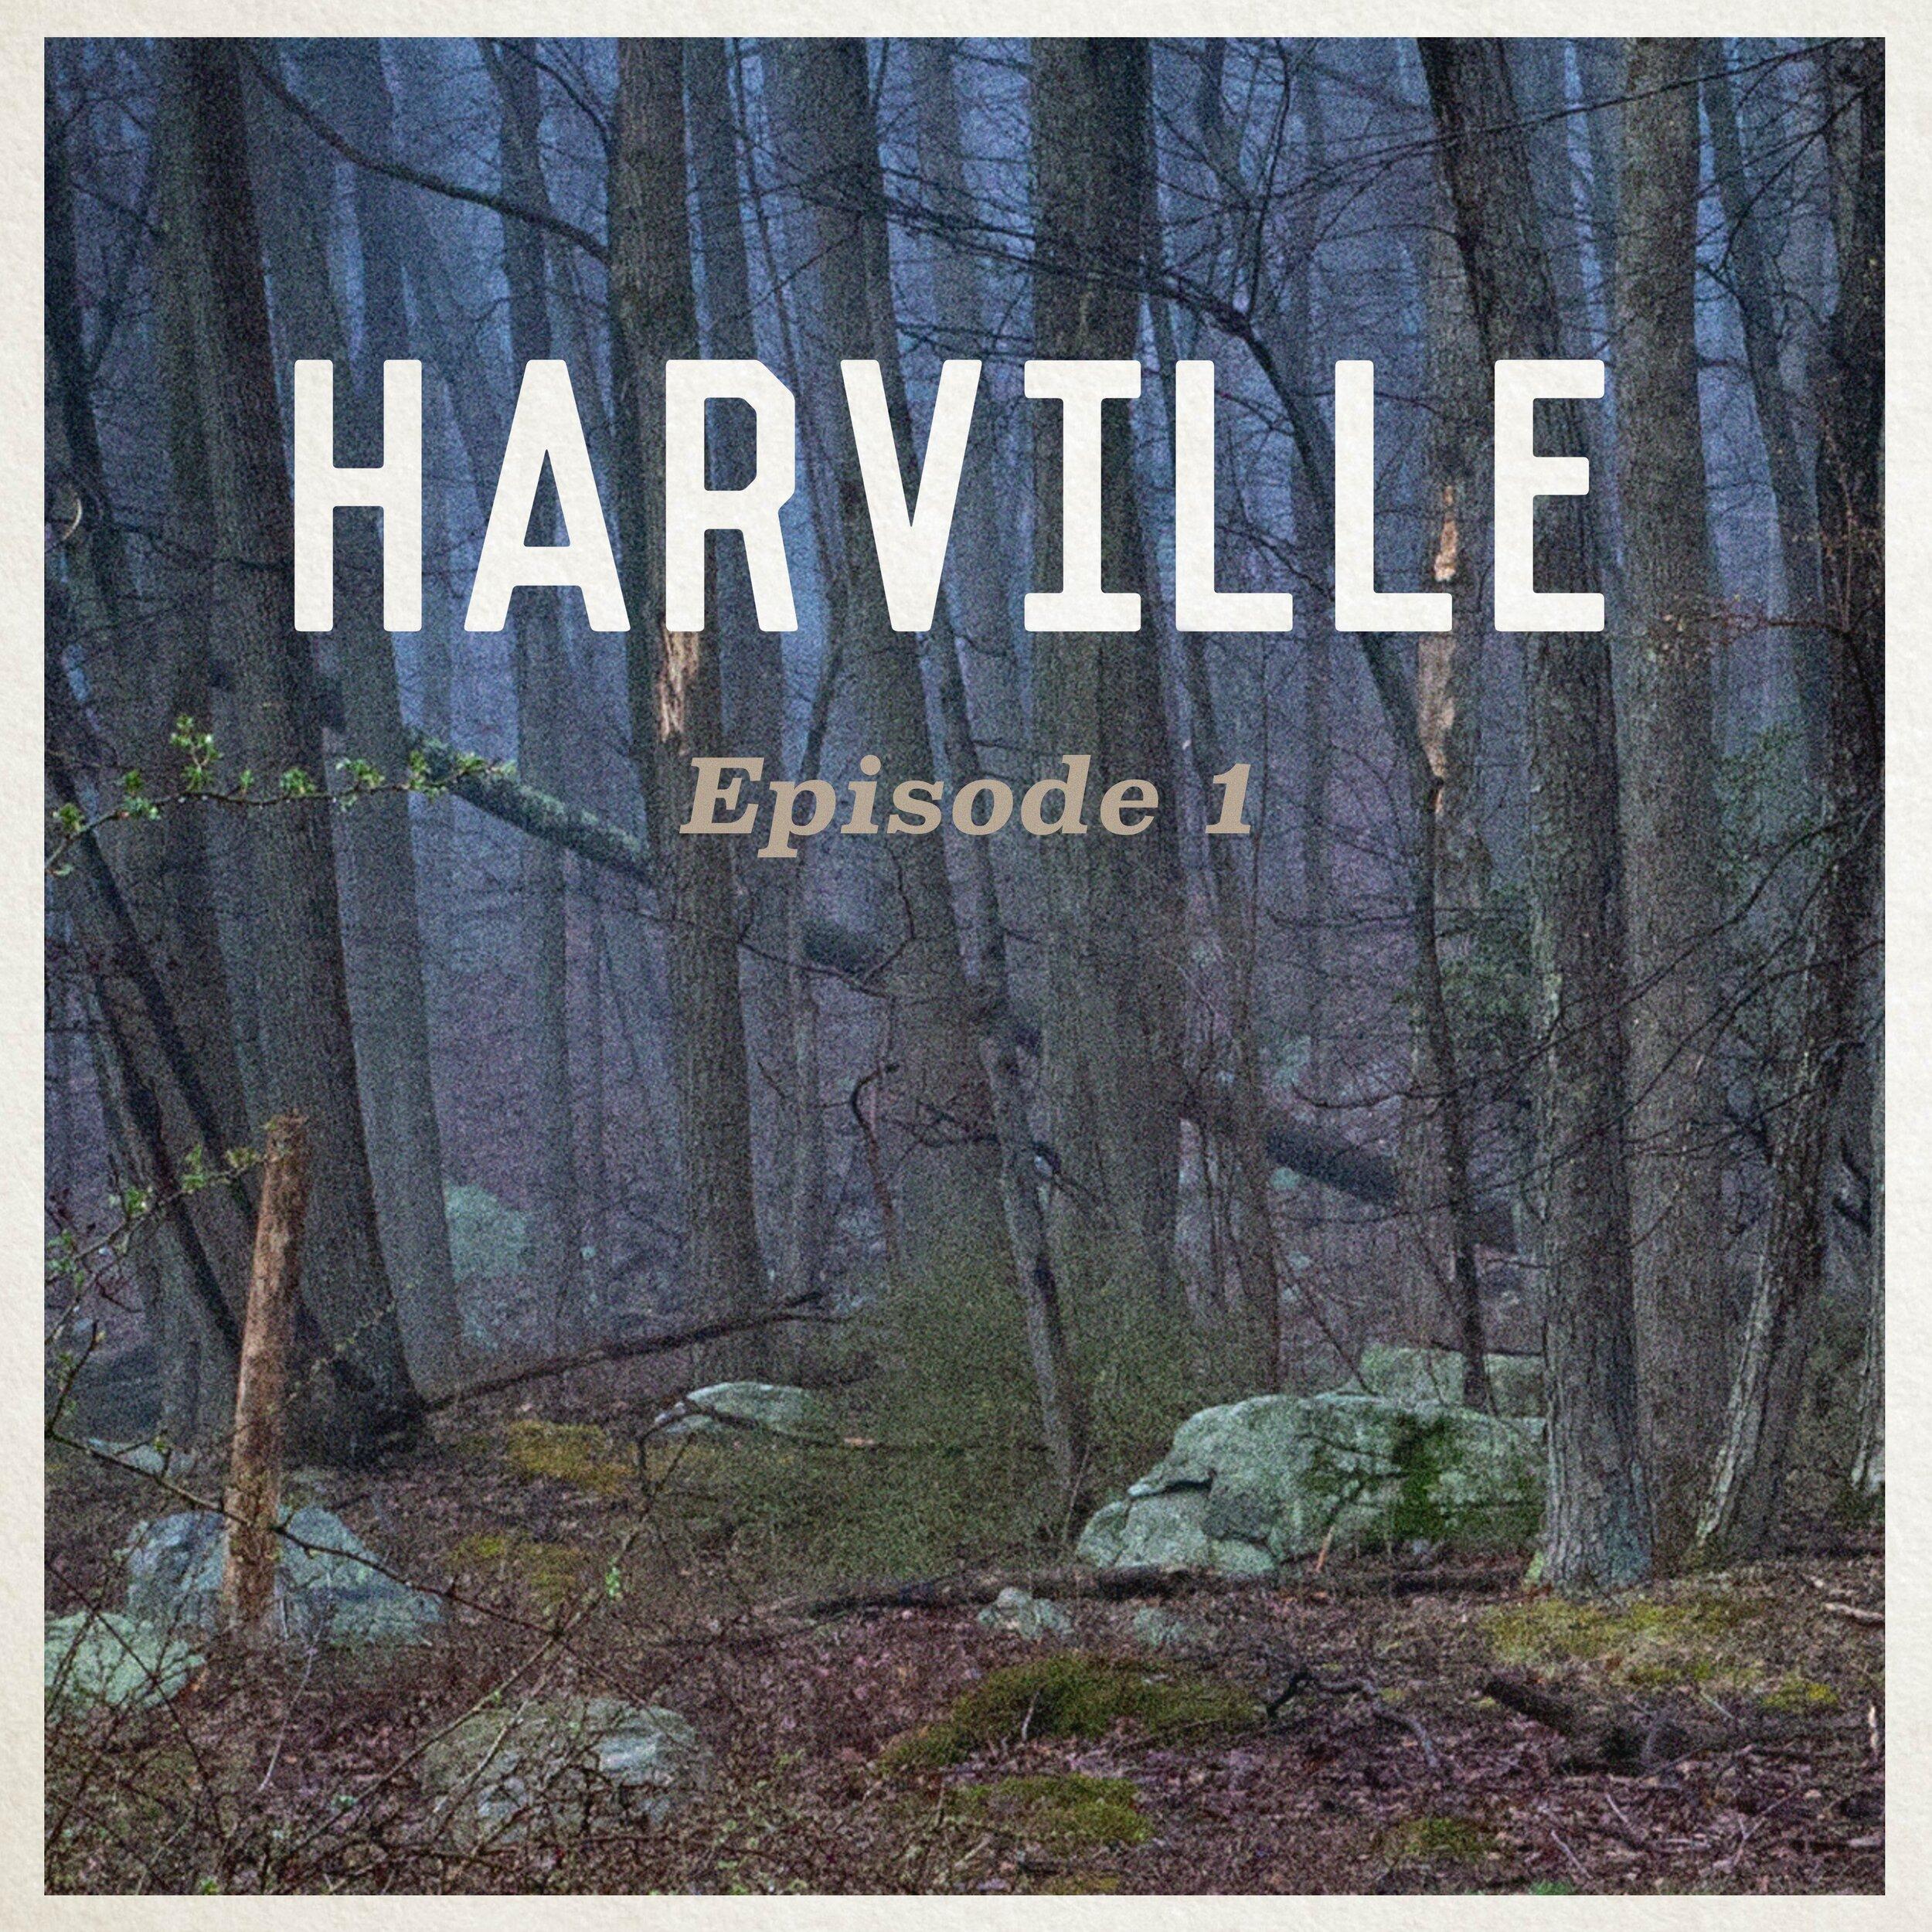 Harville - Episode 1